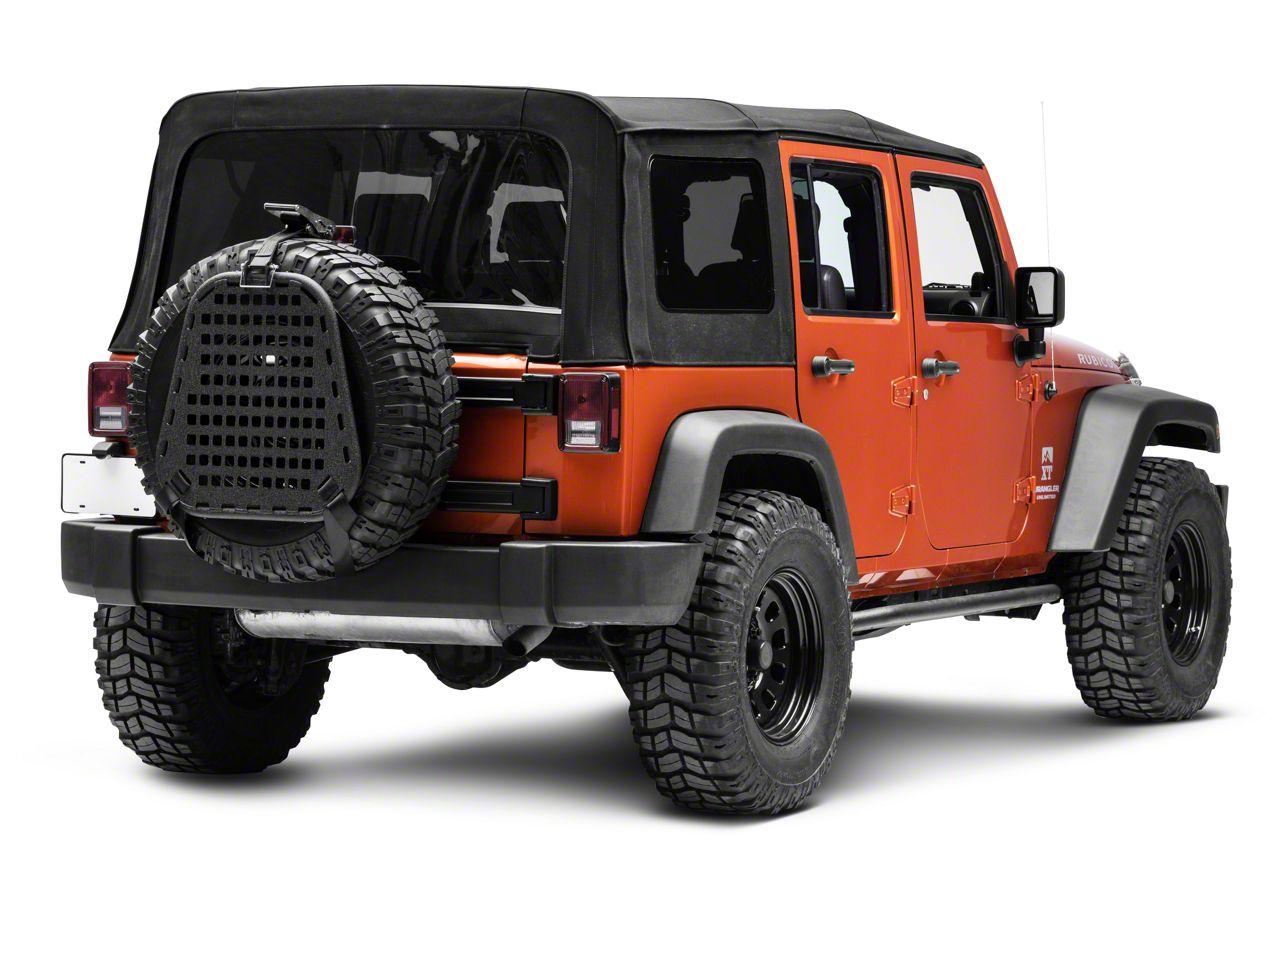 Smittybilt iRack2 Intelligent Racking System (87-18 Jeep Wrangler YJ, TJ, JK & JL)